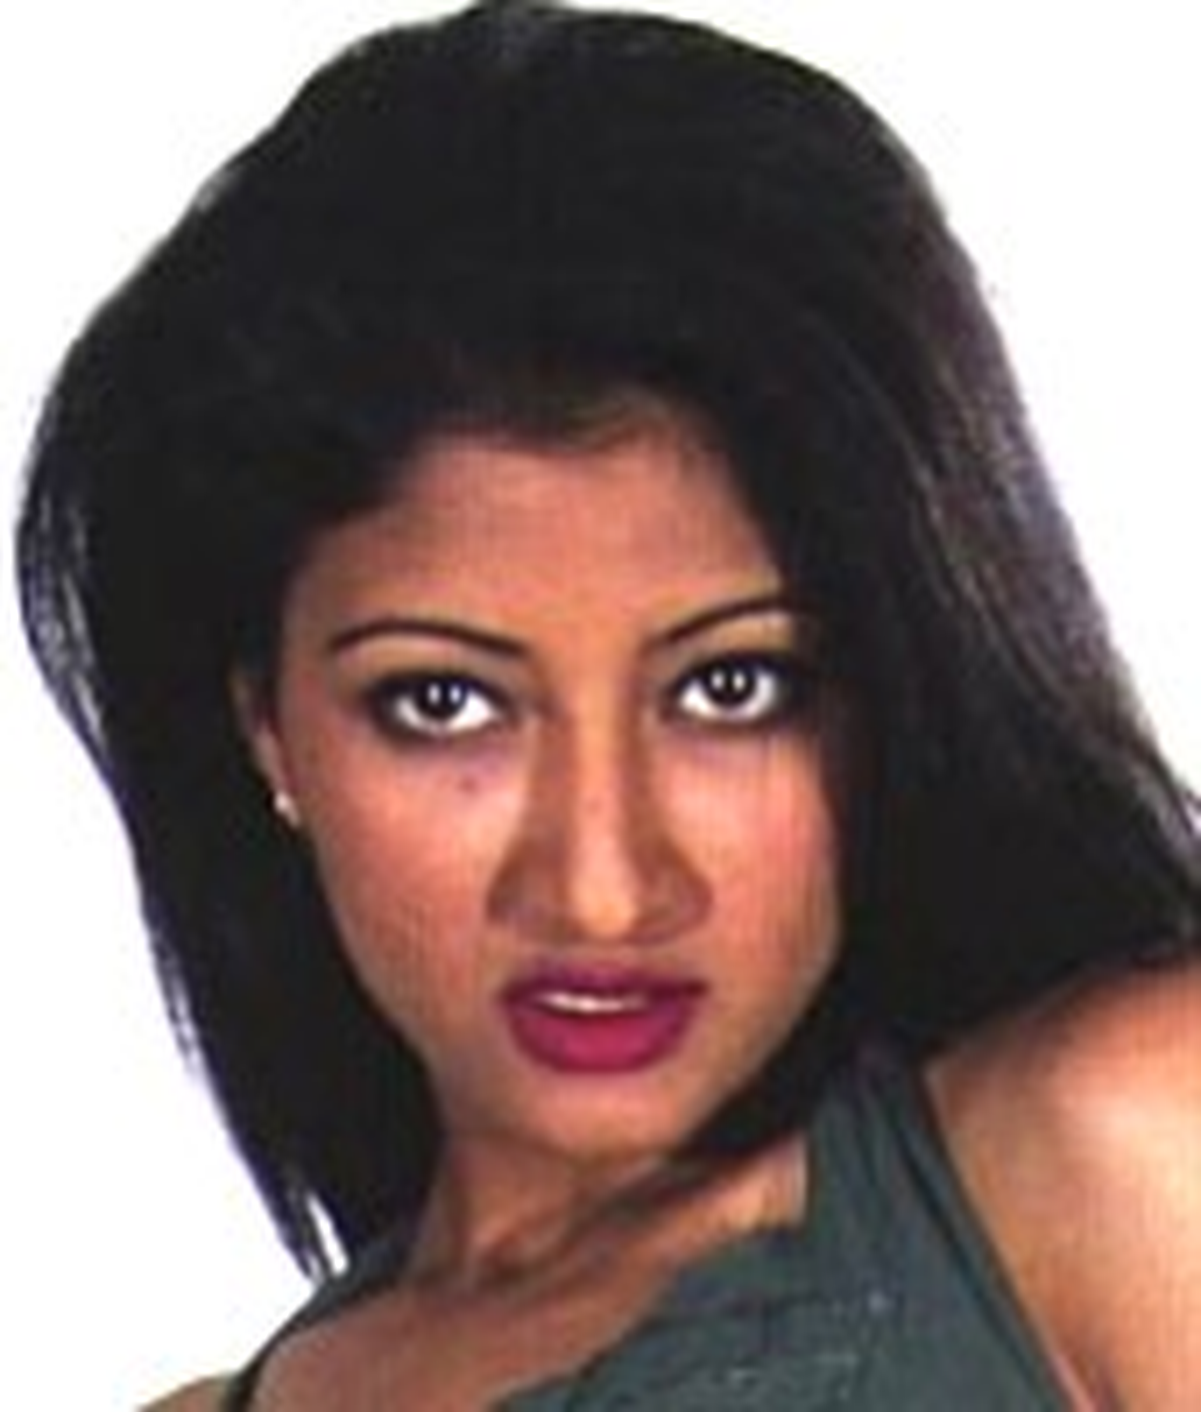 Nadia Nyce Porno Pics nadia nyce wiki & bio - pornographic actress